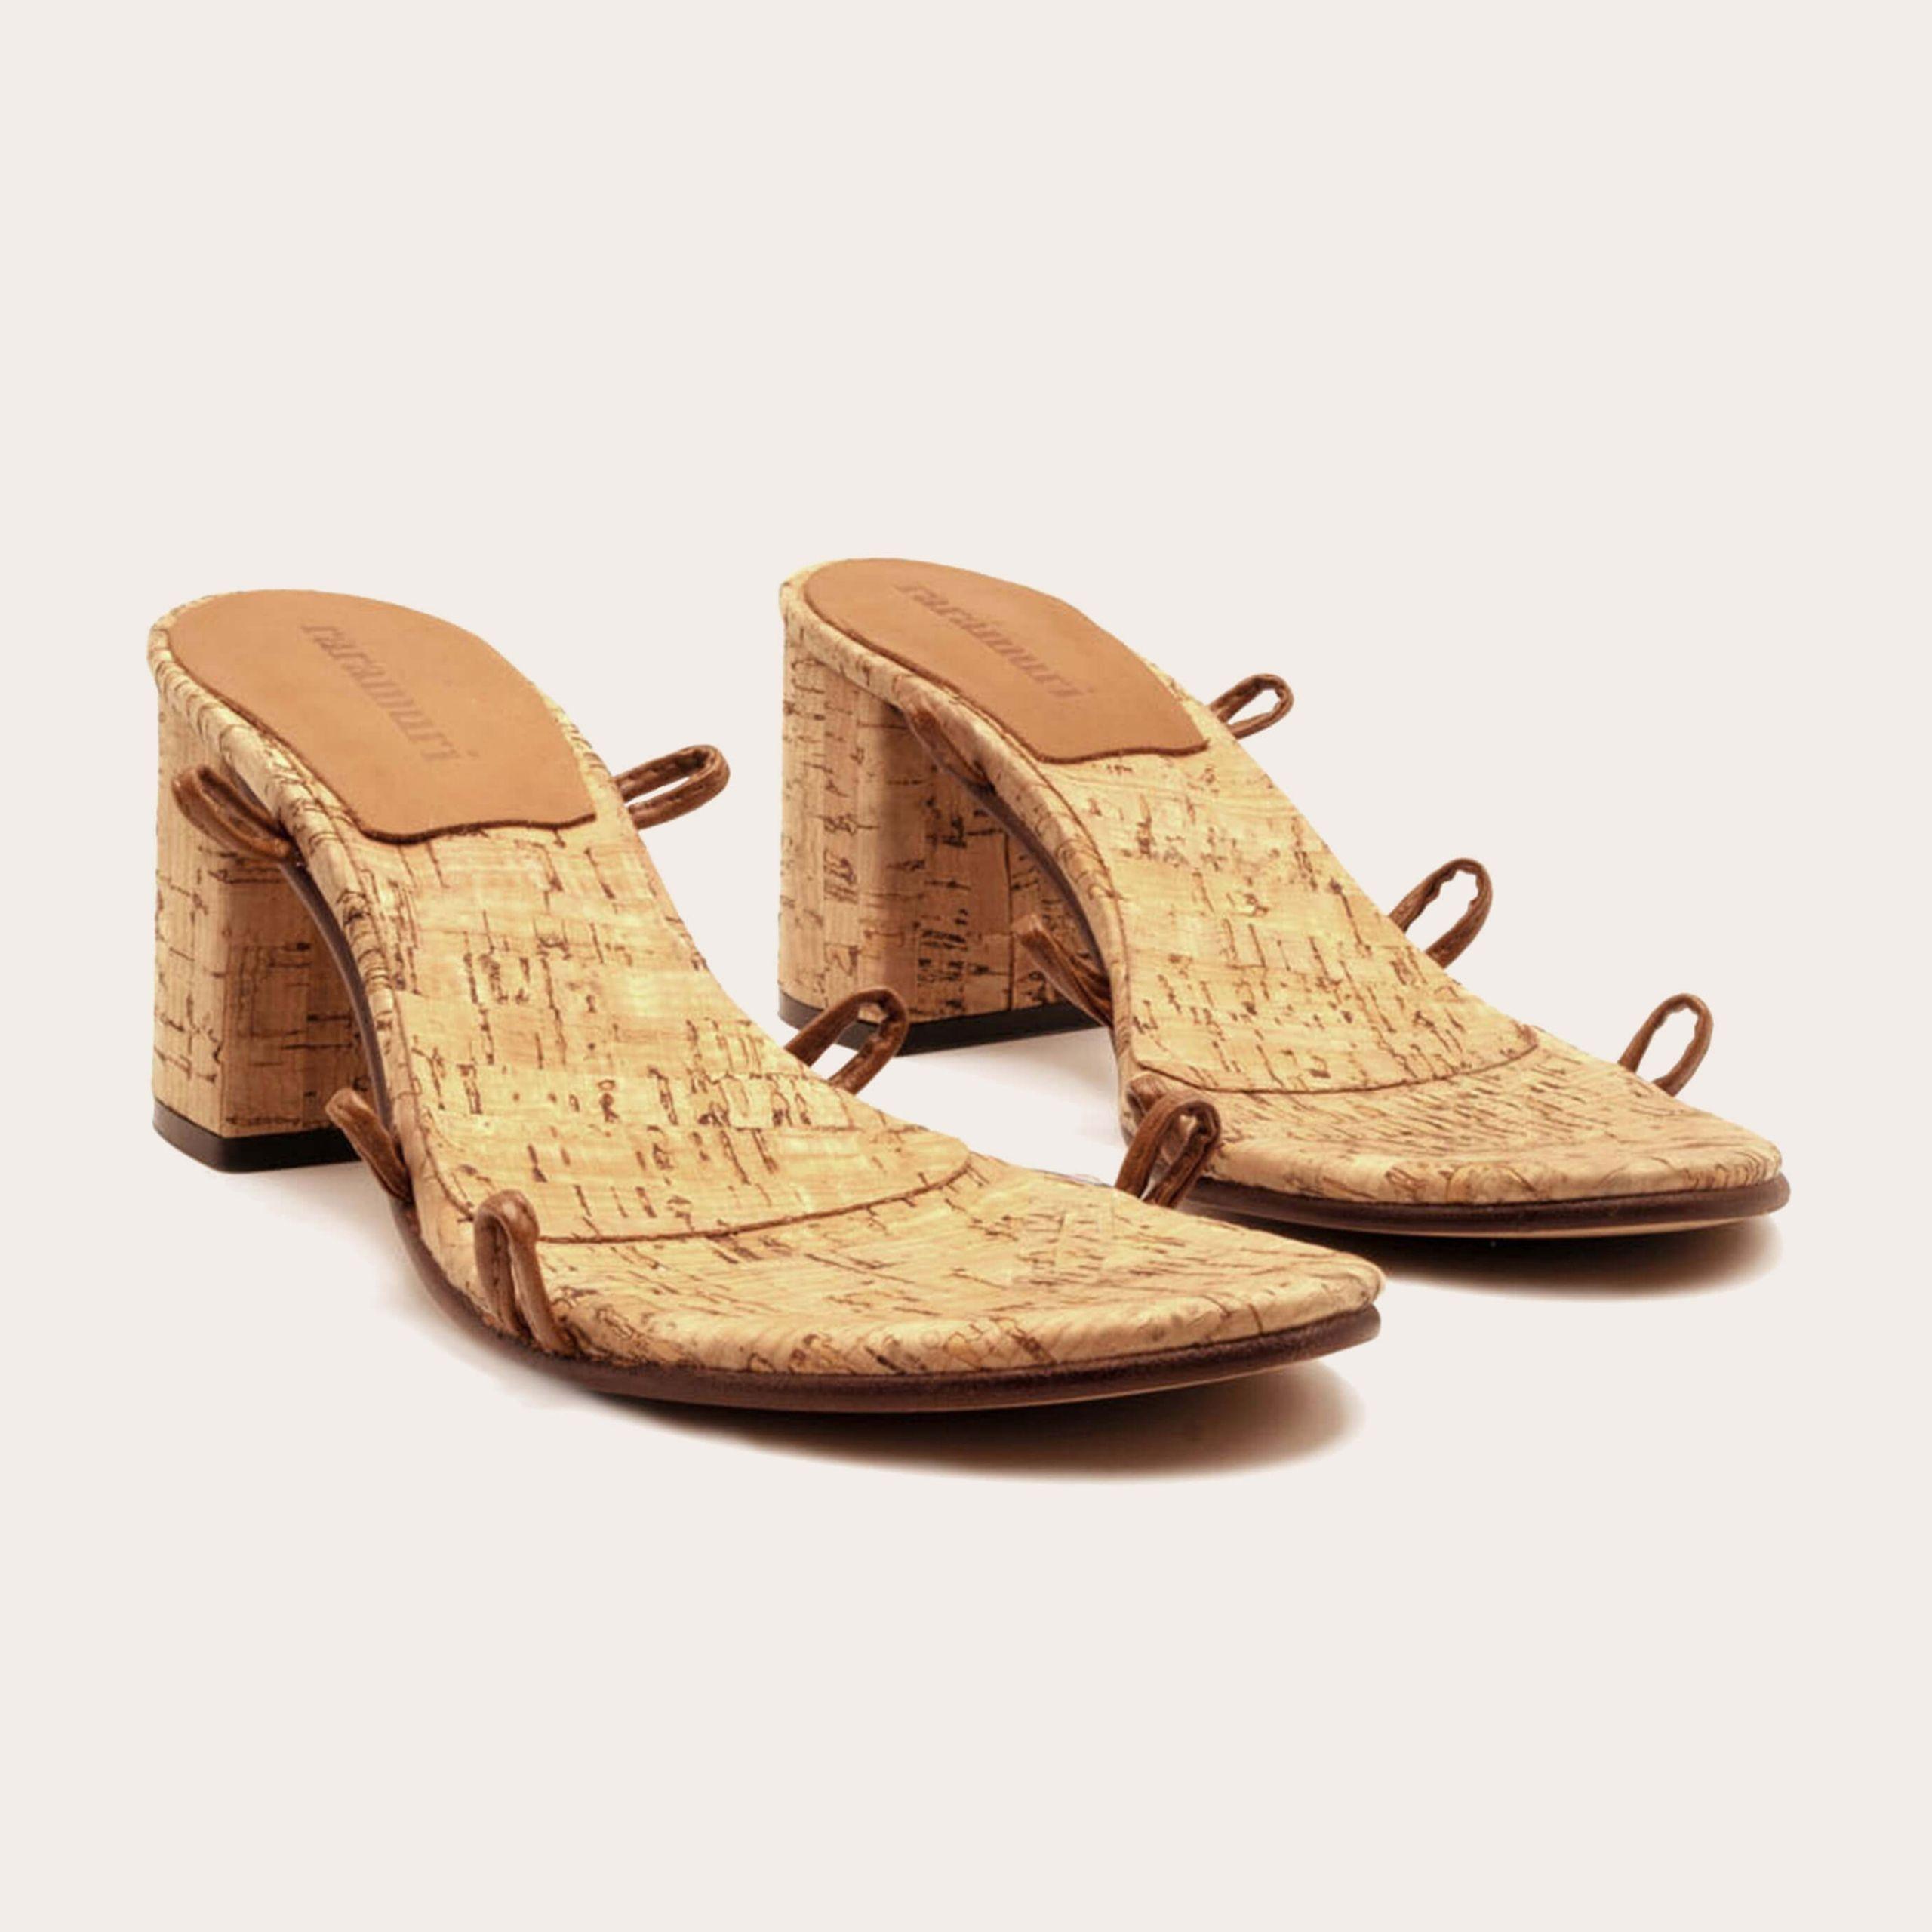 camila_2_lintsandalen sandals travelsandals vegan sustainable sandals wikkelsandalen